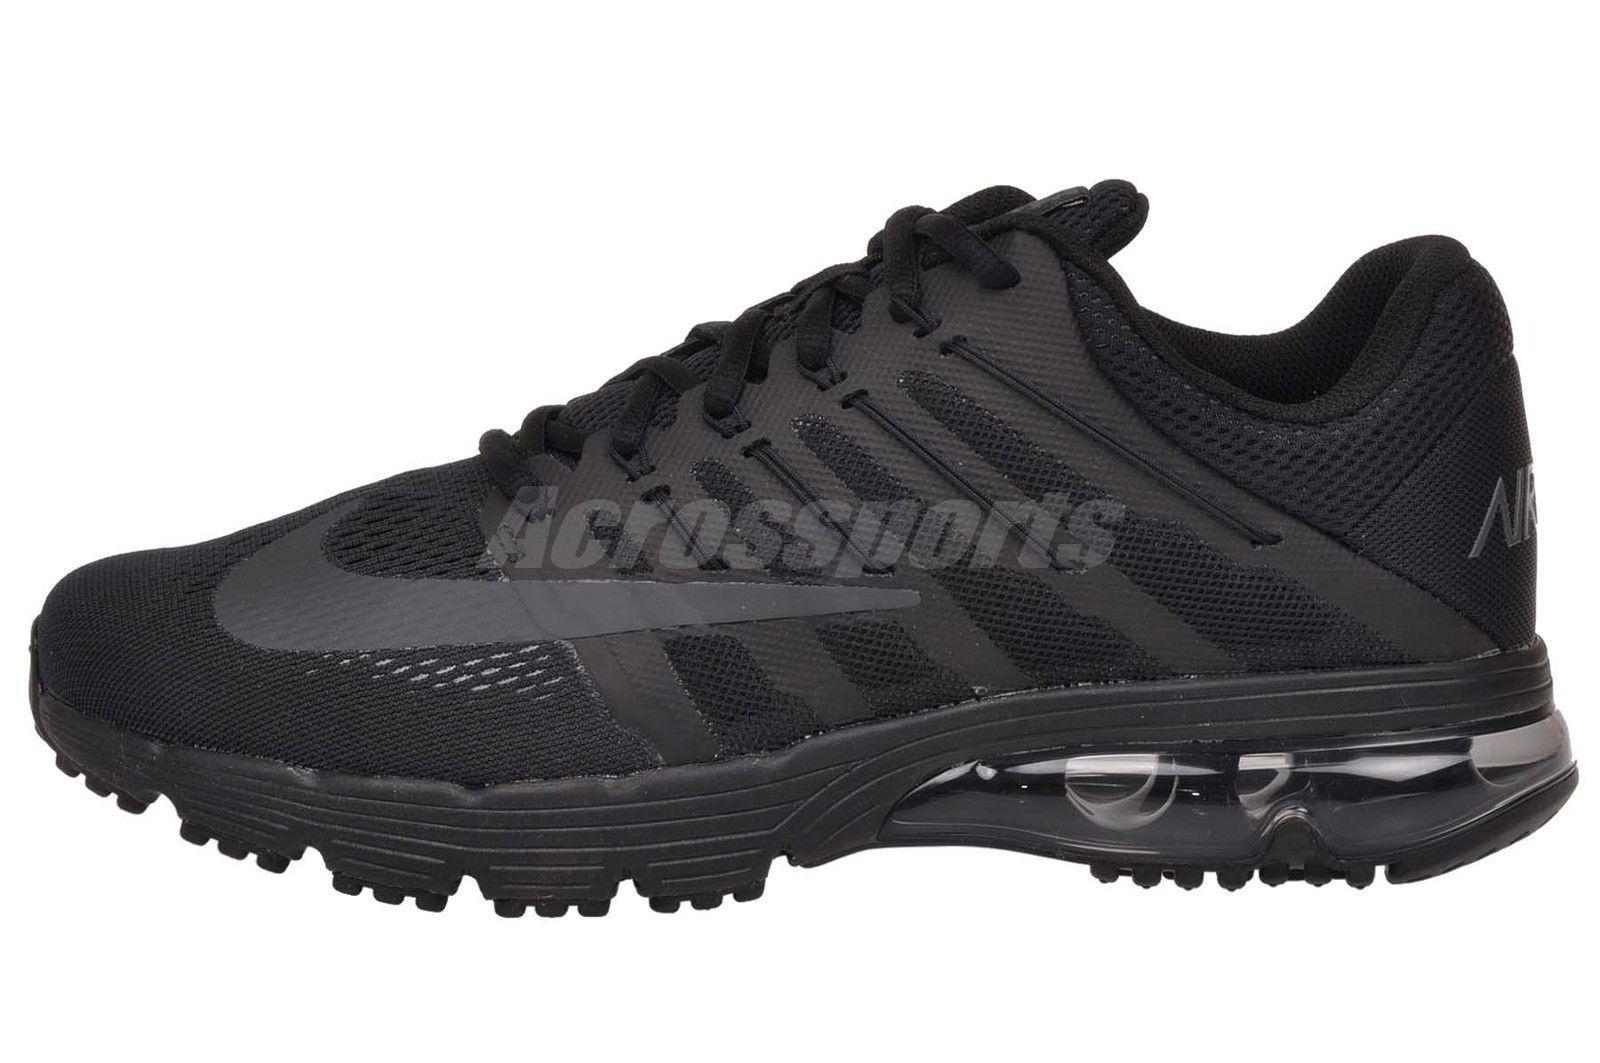 promo code 5f61e adbb6 where to buy nike 2015 blue black green air max 502db 1c0ce  sale nike air  max excellerate 4 mens running shoes 2015 sneakers black 806770 020 b1ec9  7a78a